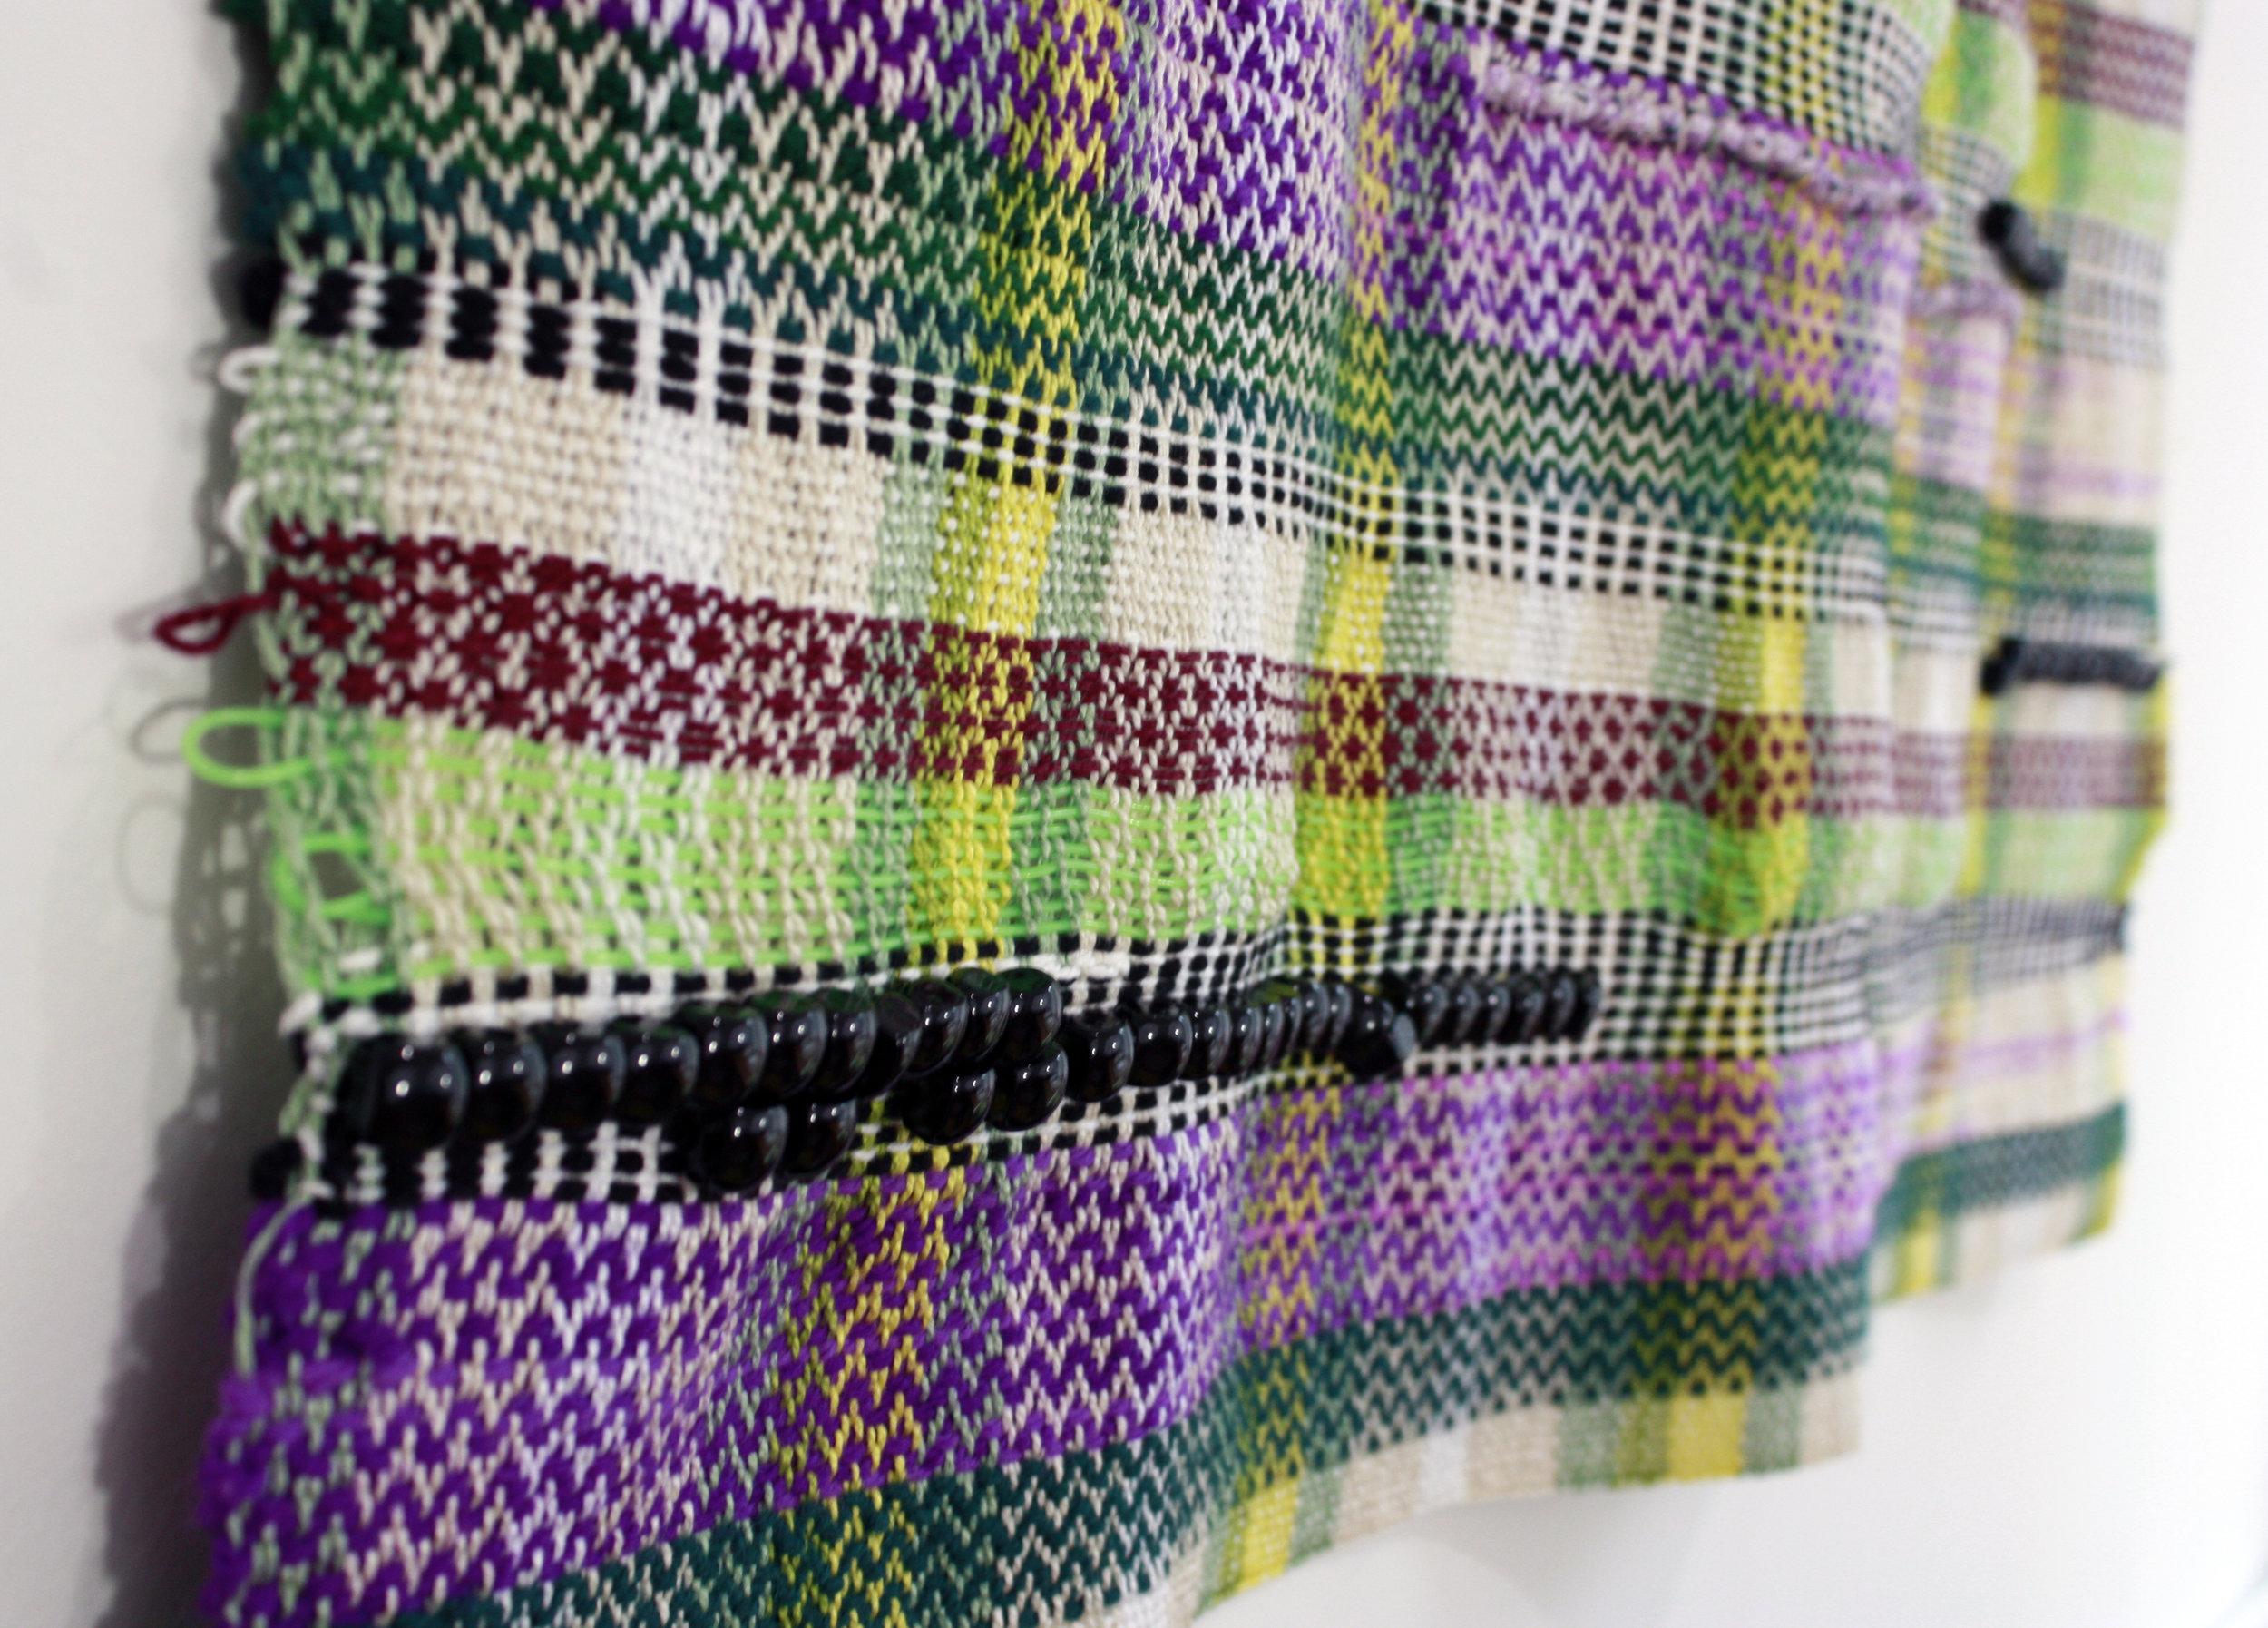 Handwoven tapestry detail shot